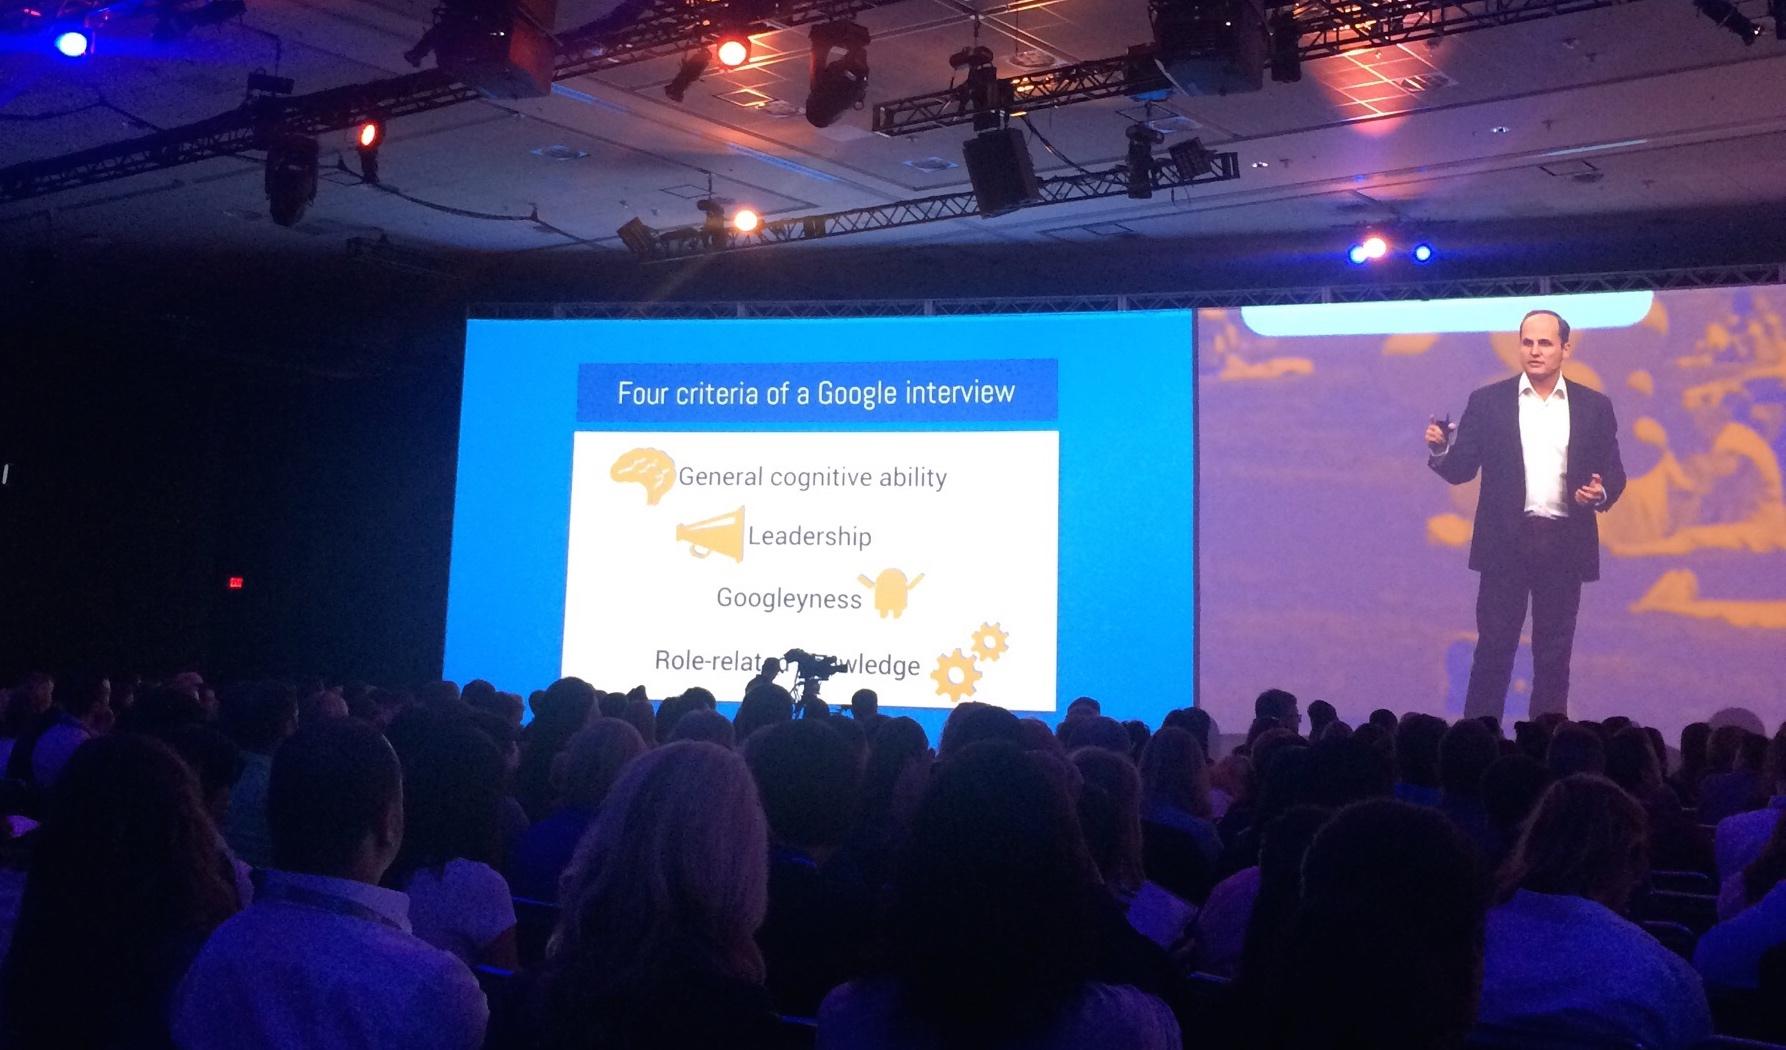 Google Head Recruiter, Lazlo Bock on stage talking about Googleyness